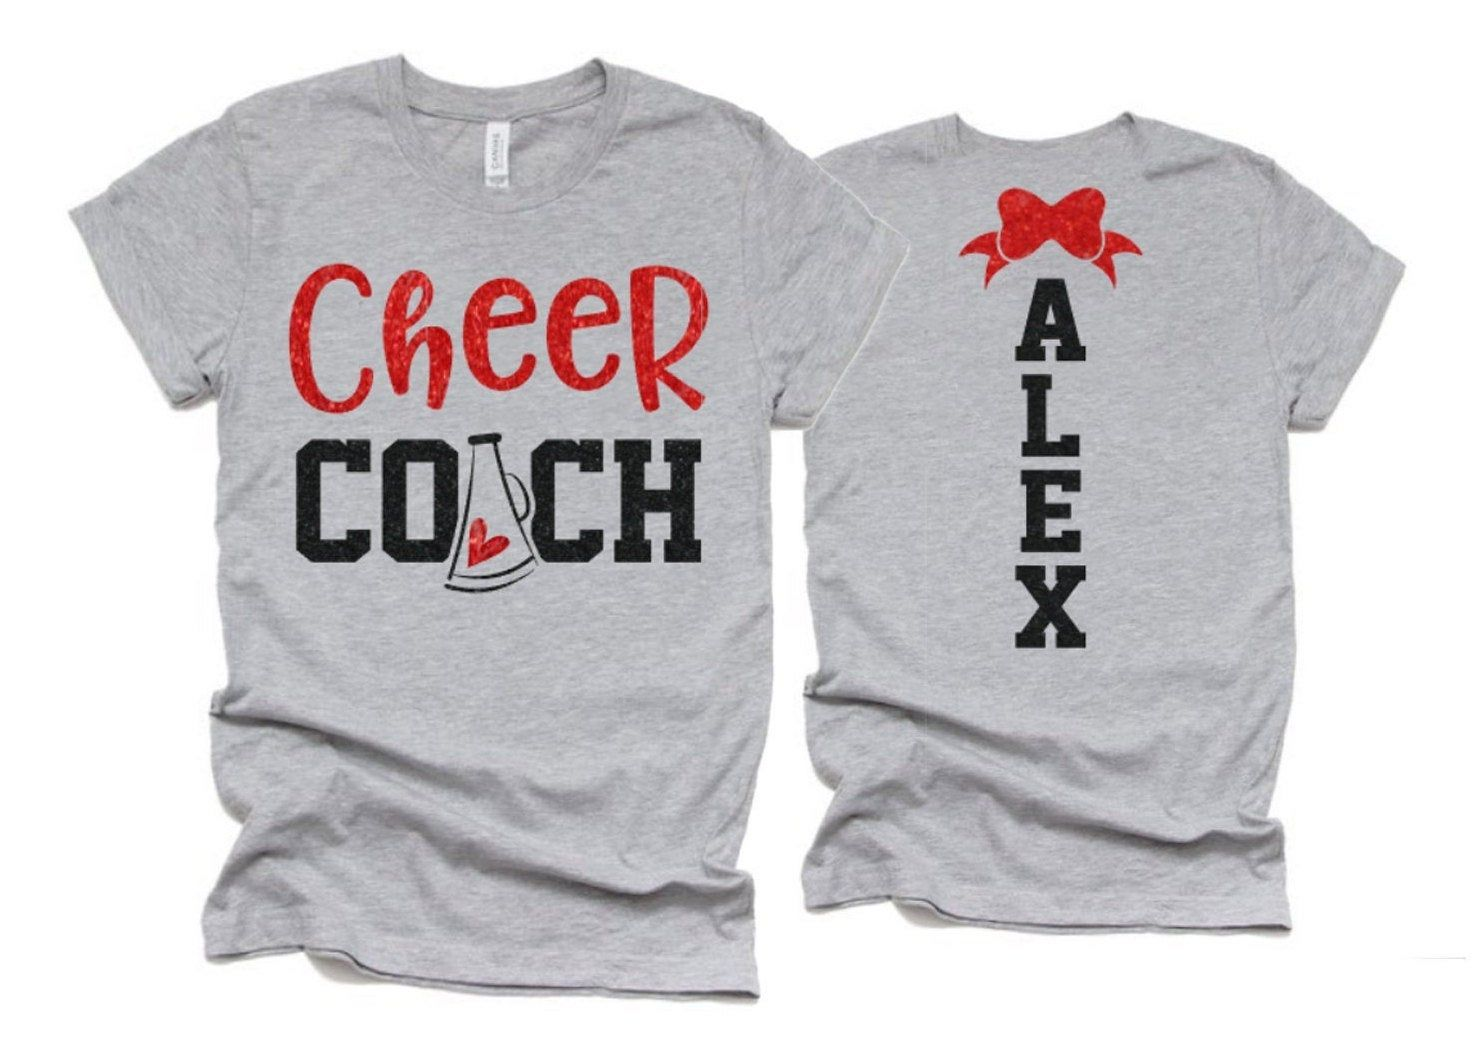 Cheer Spirit Wear Cheer Mom Shirt Short Sleeve Shirt Bella Canvas T-shirt Cheer Bling Cheer Shirt